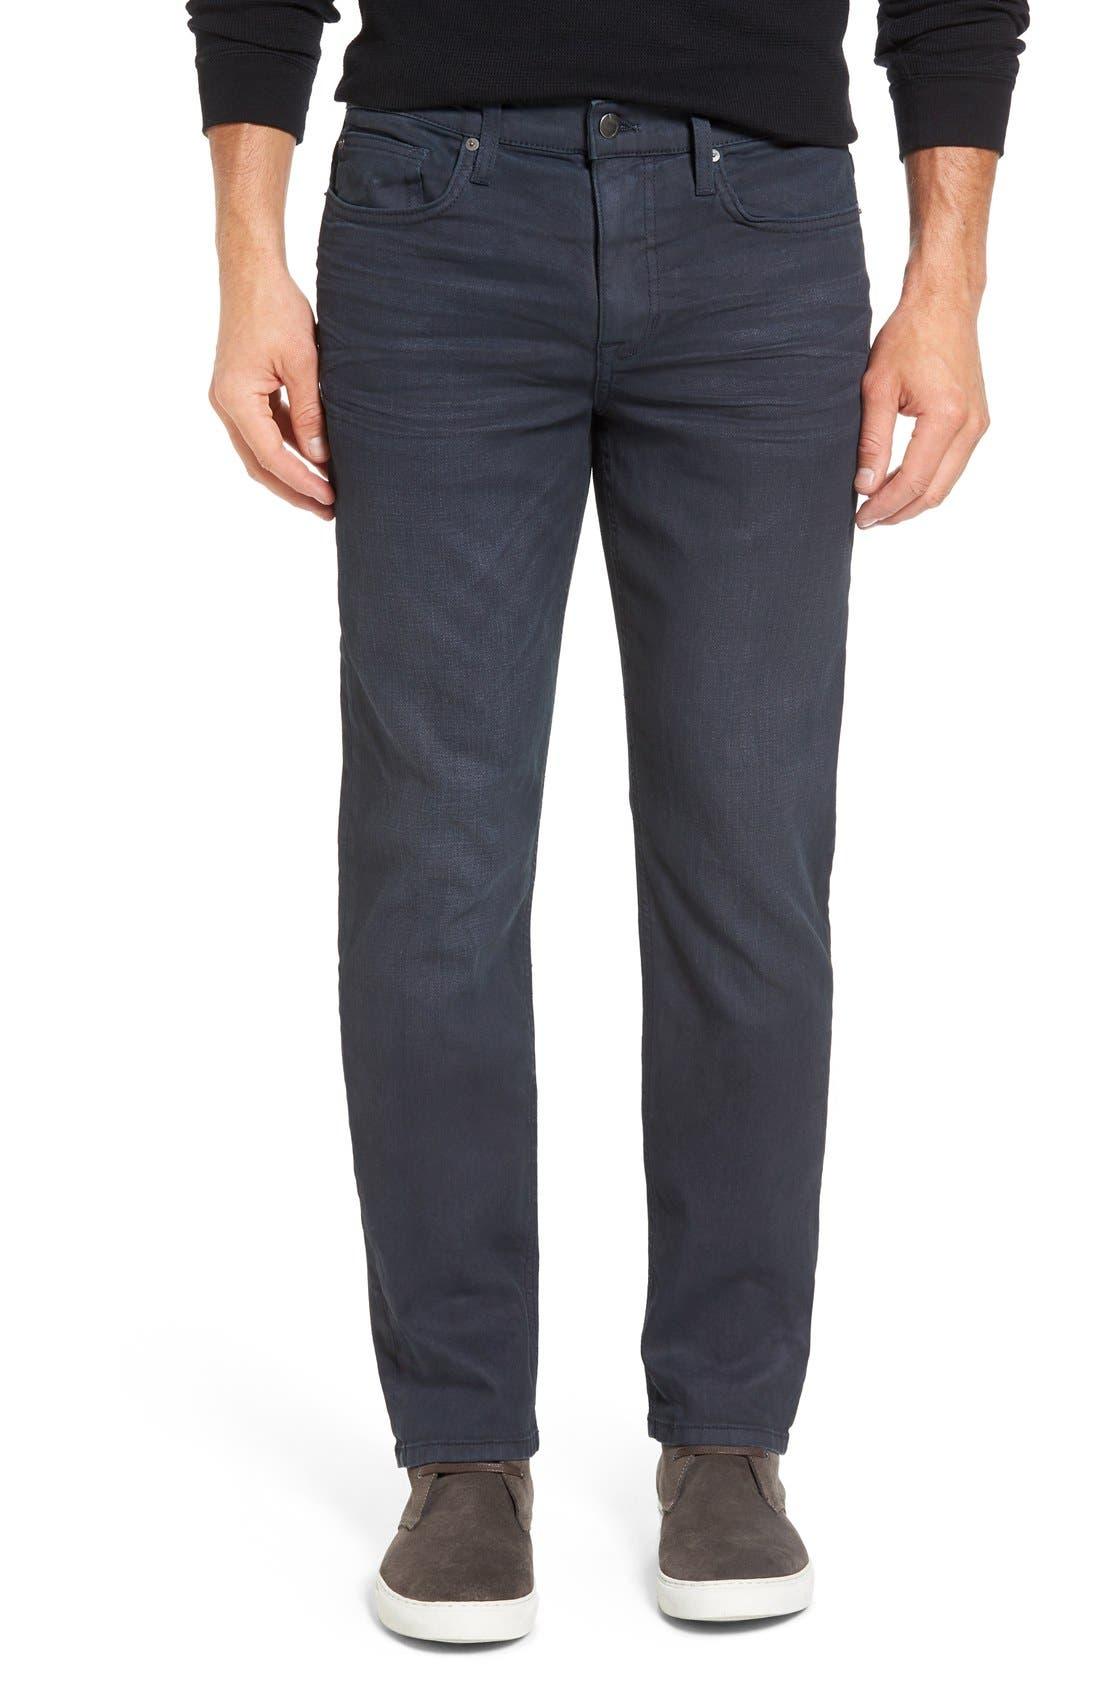 JOES Brixton Slim Fit Jeans